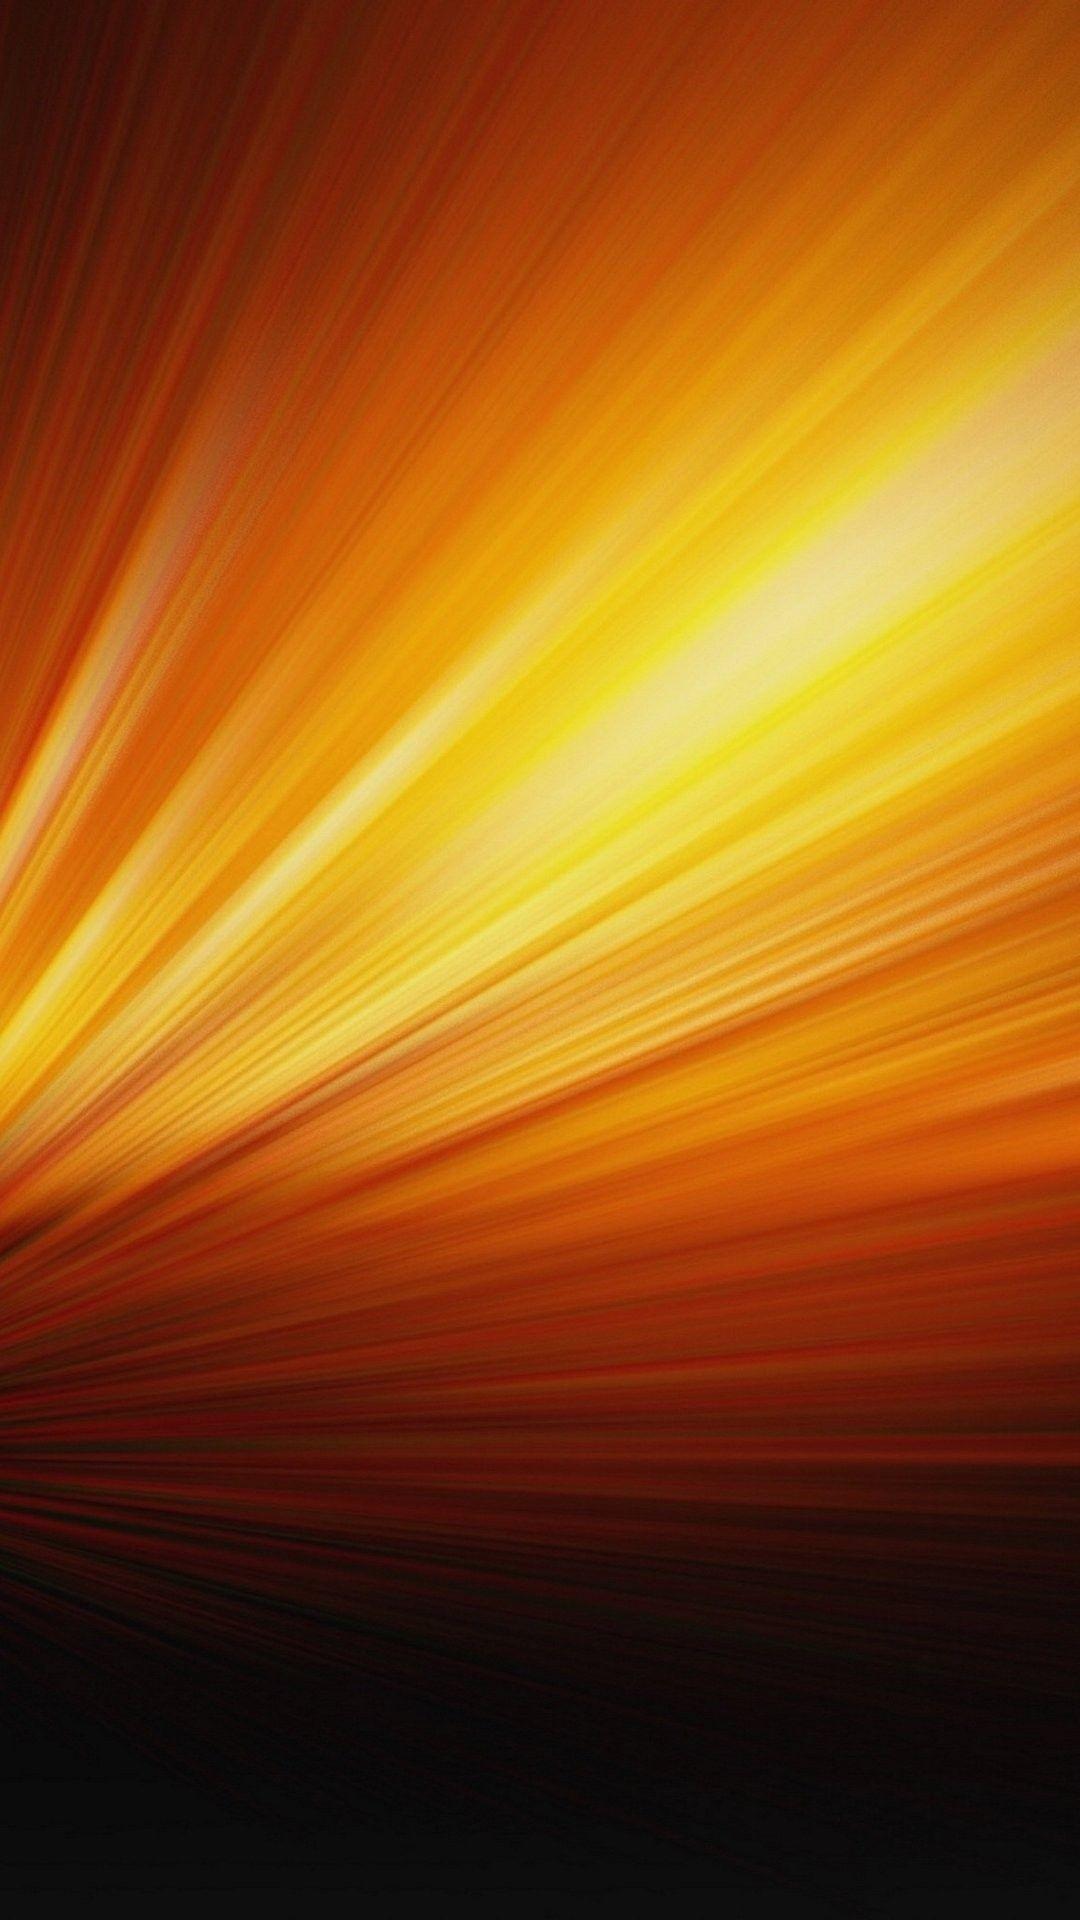 Orange lock screen wallpaper